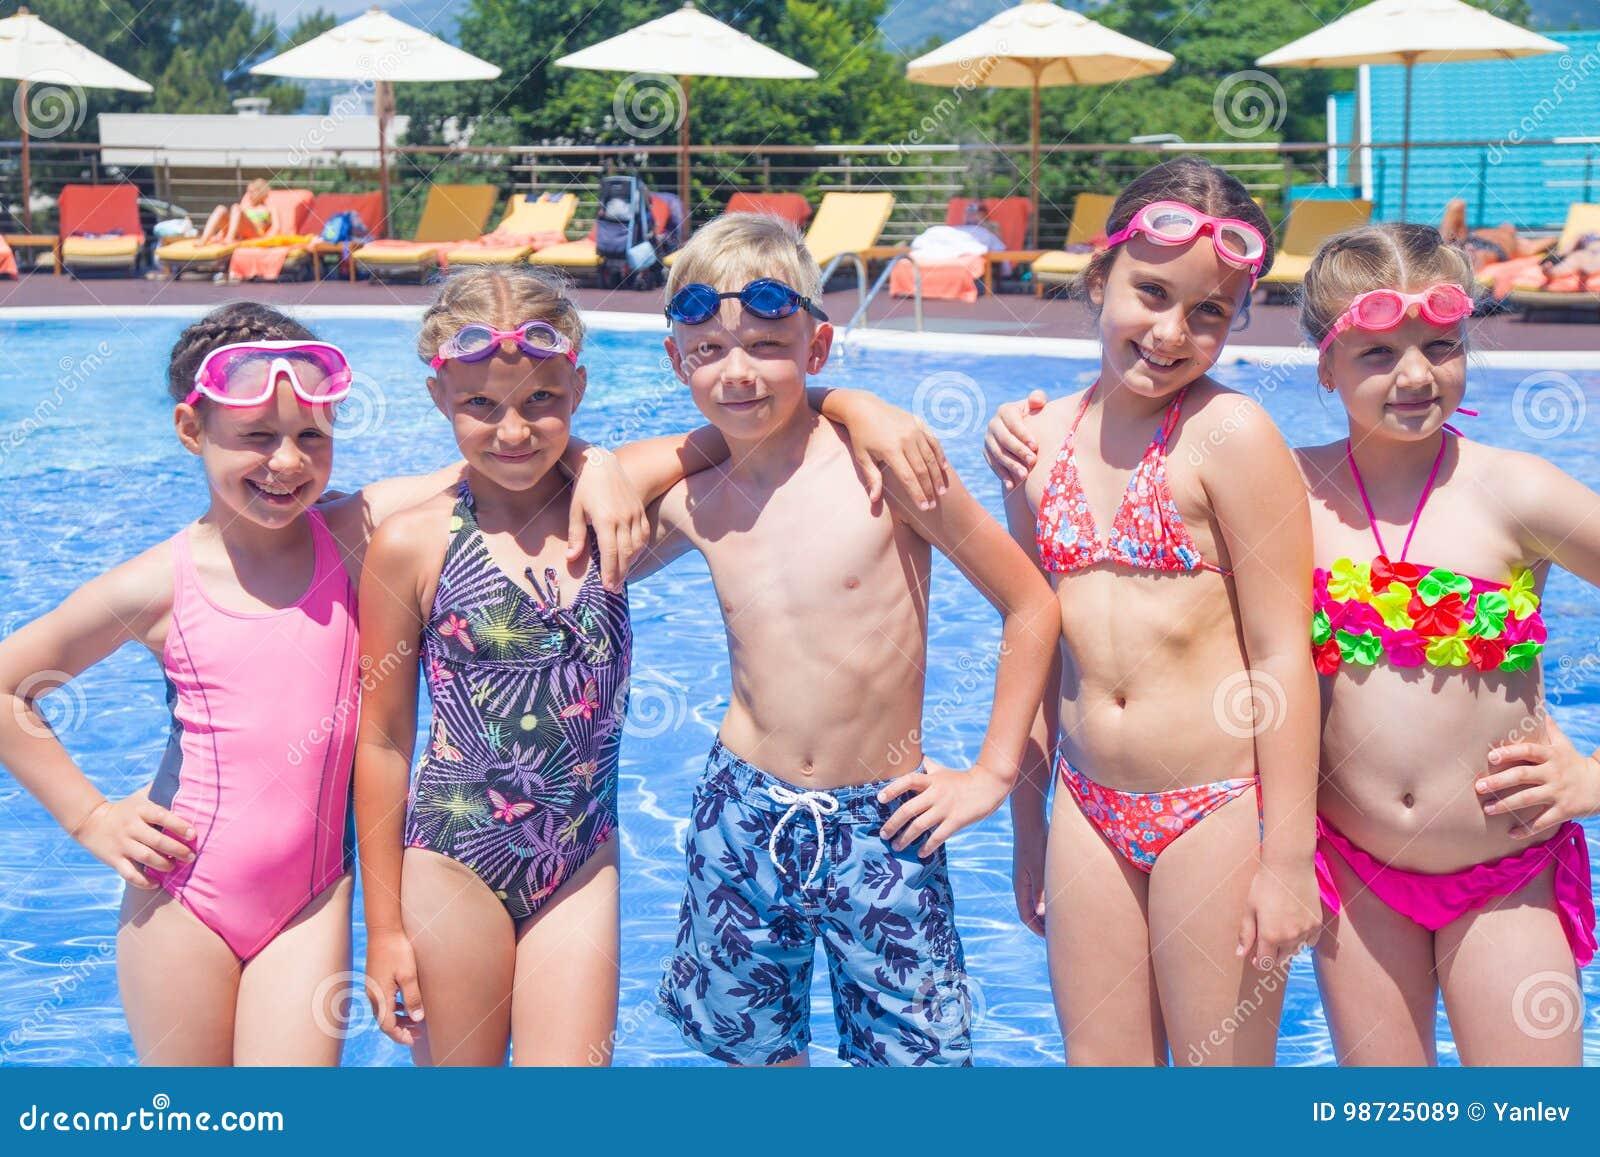 Kinderspiel im Pool am Erholungsort